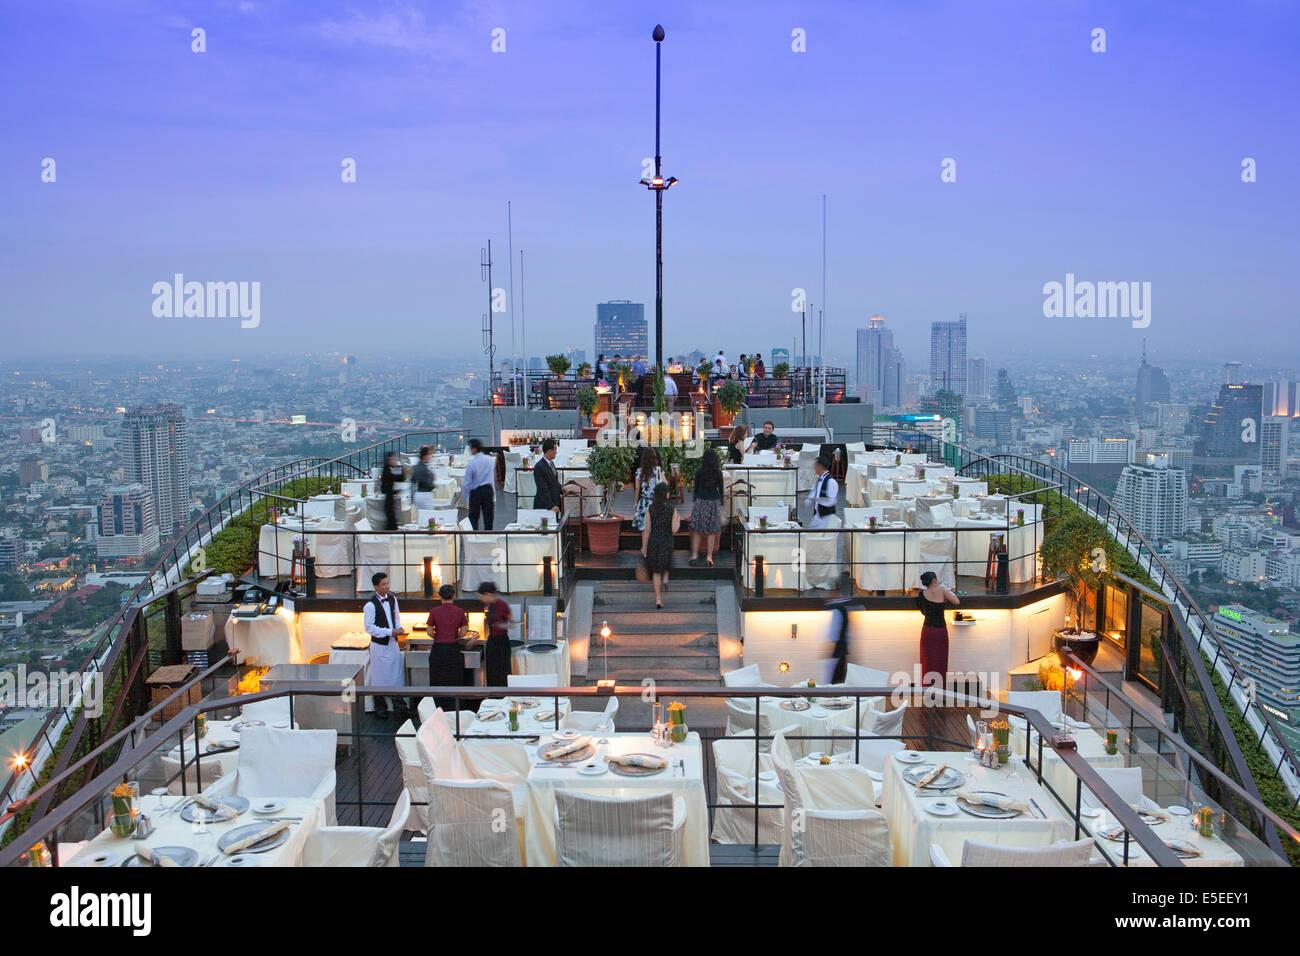 Vertigo restaurant and bar on the top of the Banyan Tree hotel in Bangkok, Thailand - Stock Image